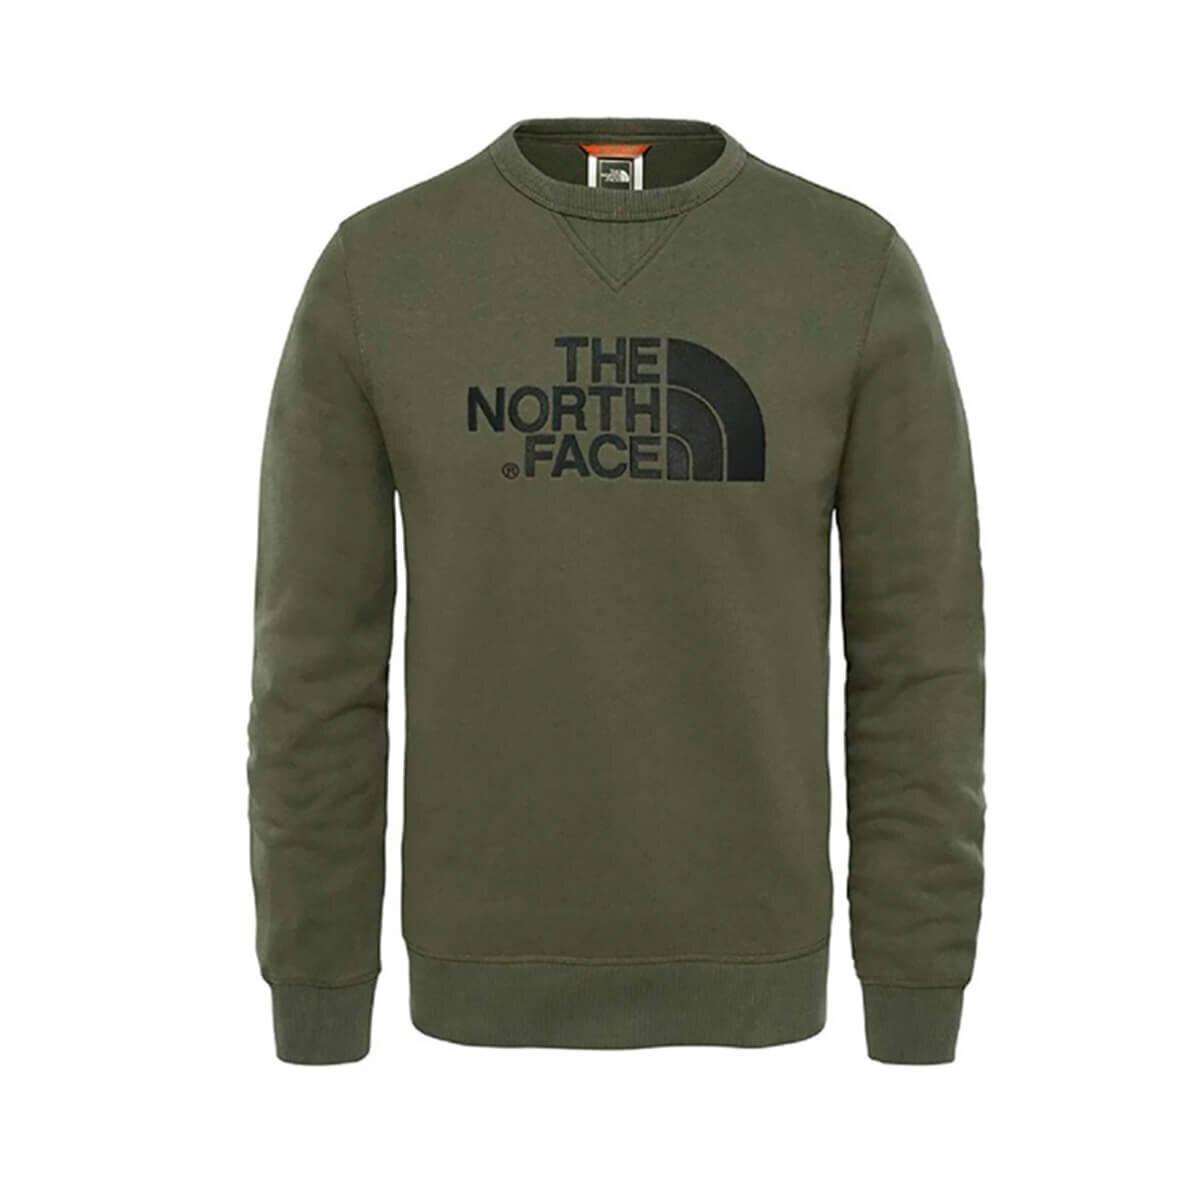 THE NORTH FACE HAKI Erkek Sweatshirt M DREW PEAK CREW